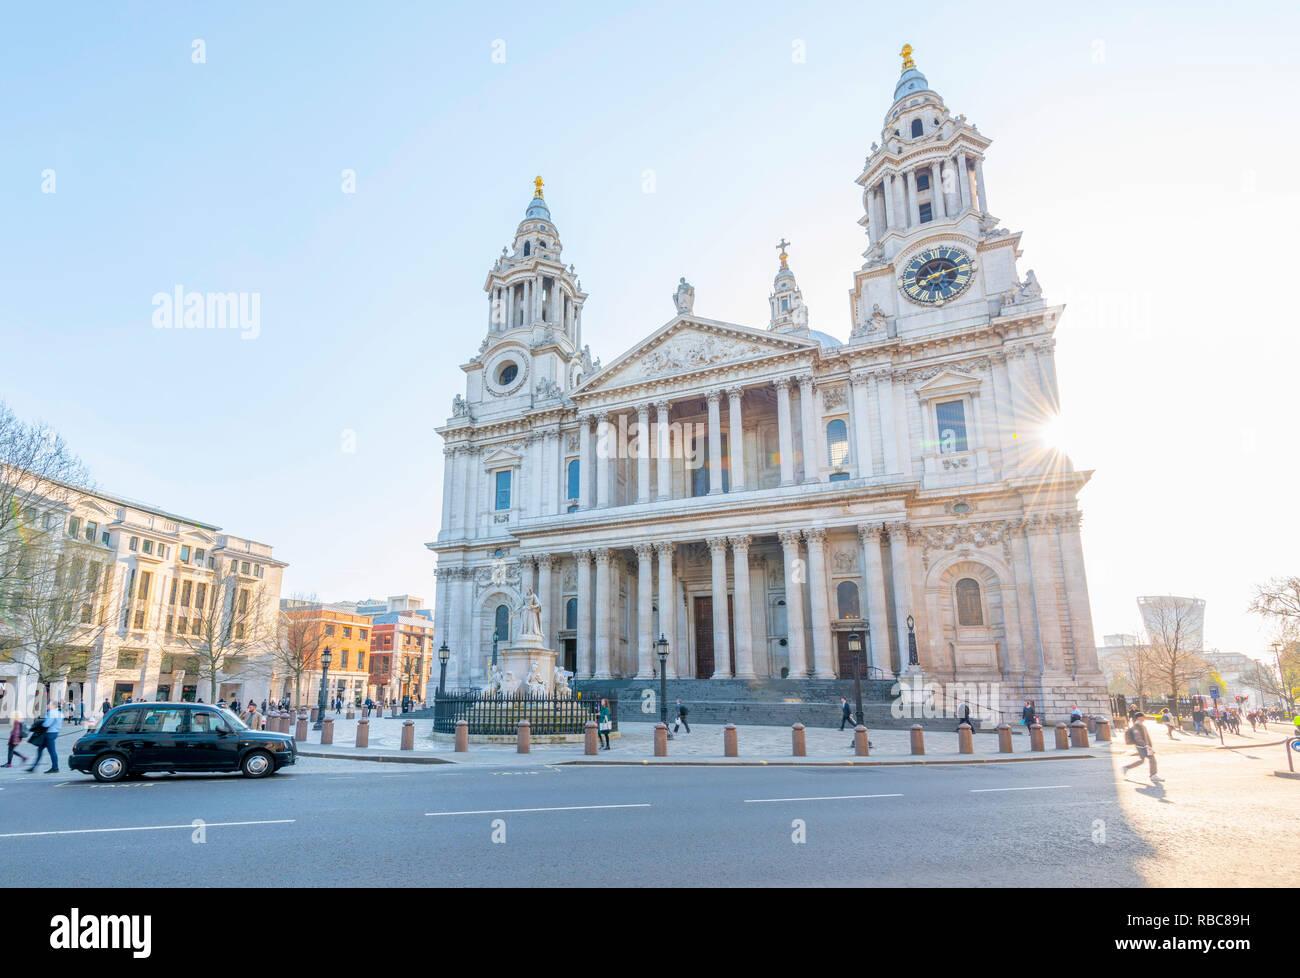 Großbritannien, England, London, Ludgate Hill, St. Paul's Cathedral Stockbild